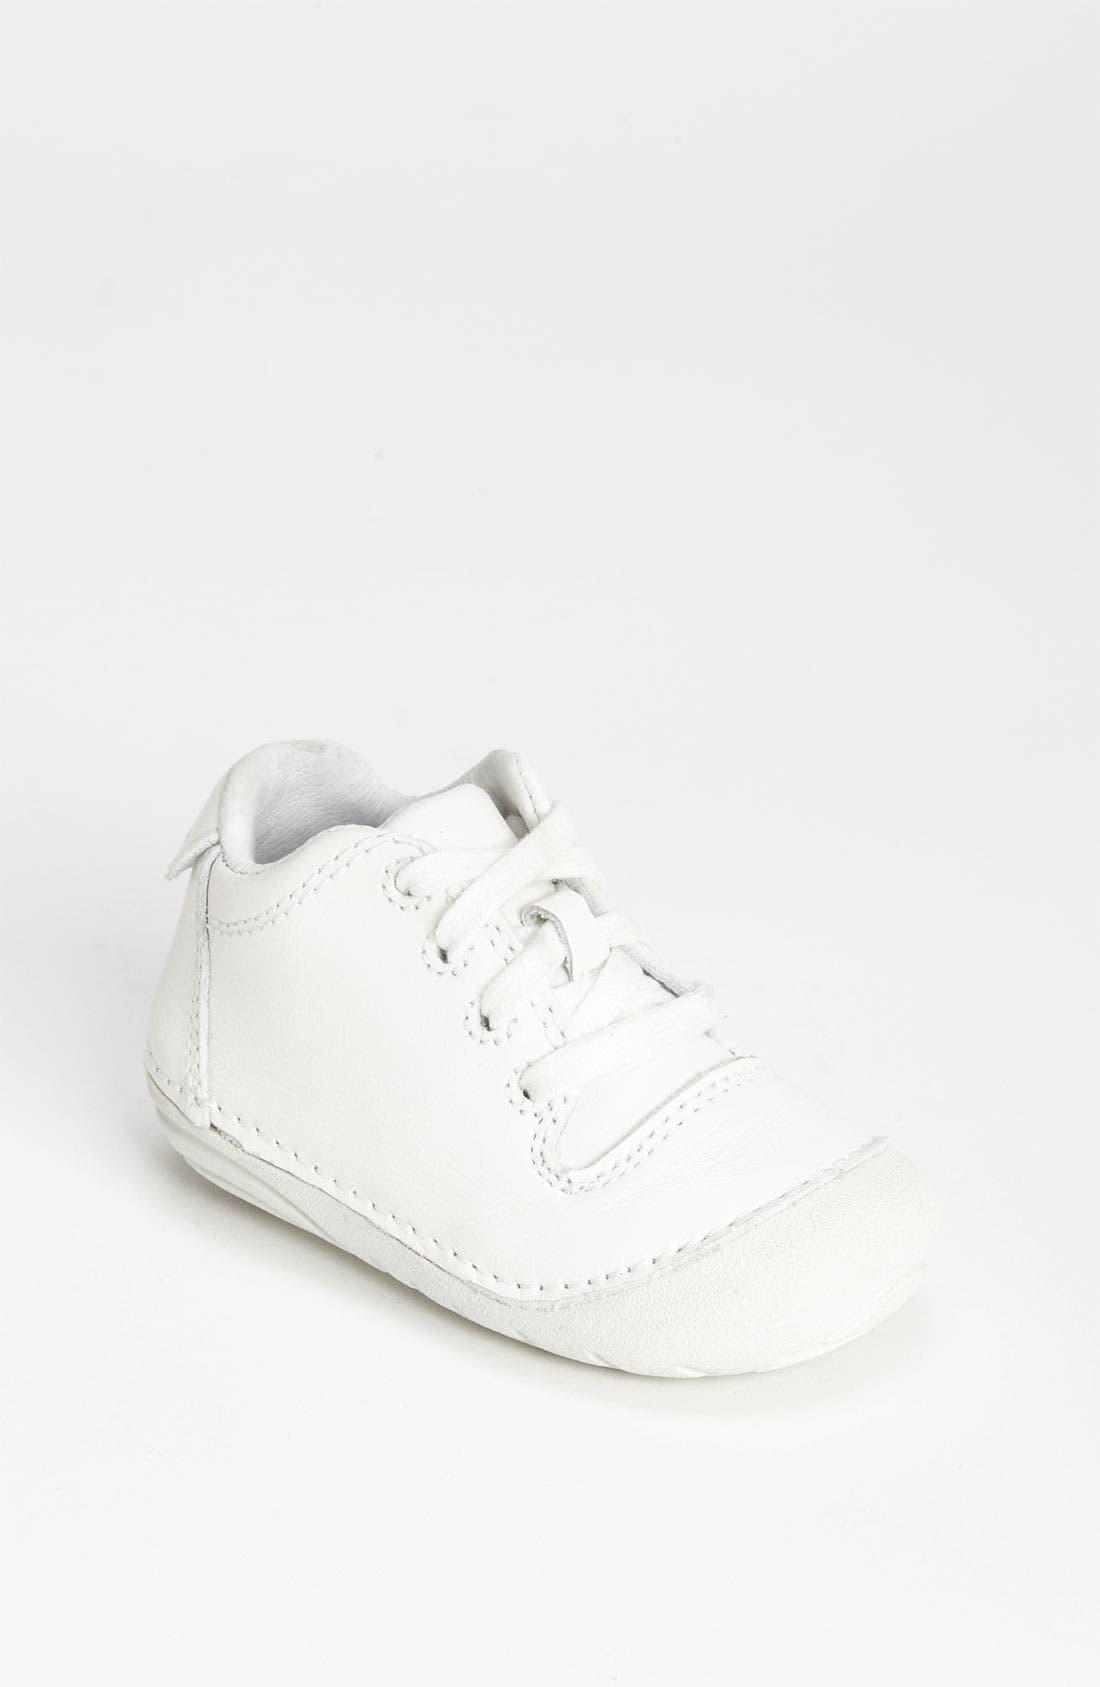 Toddler Stride Rite Freddie Sneaker Size 5 M  White